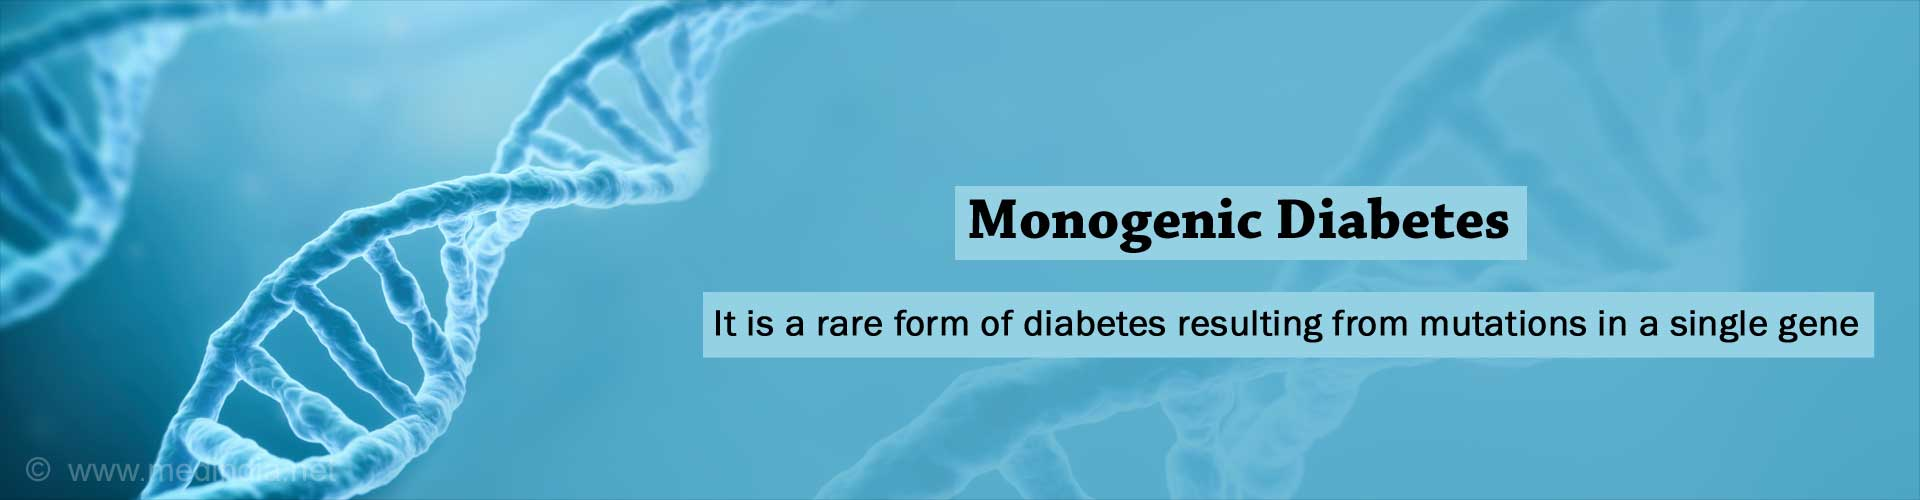 Monogenic Forms of Diabetes - Symptoms, Treatment, Diagnosis, Risk Factors, Complications